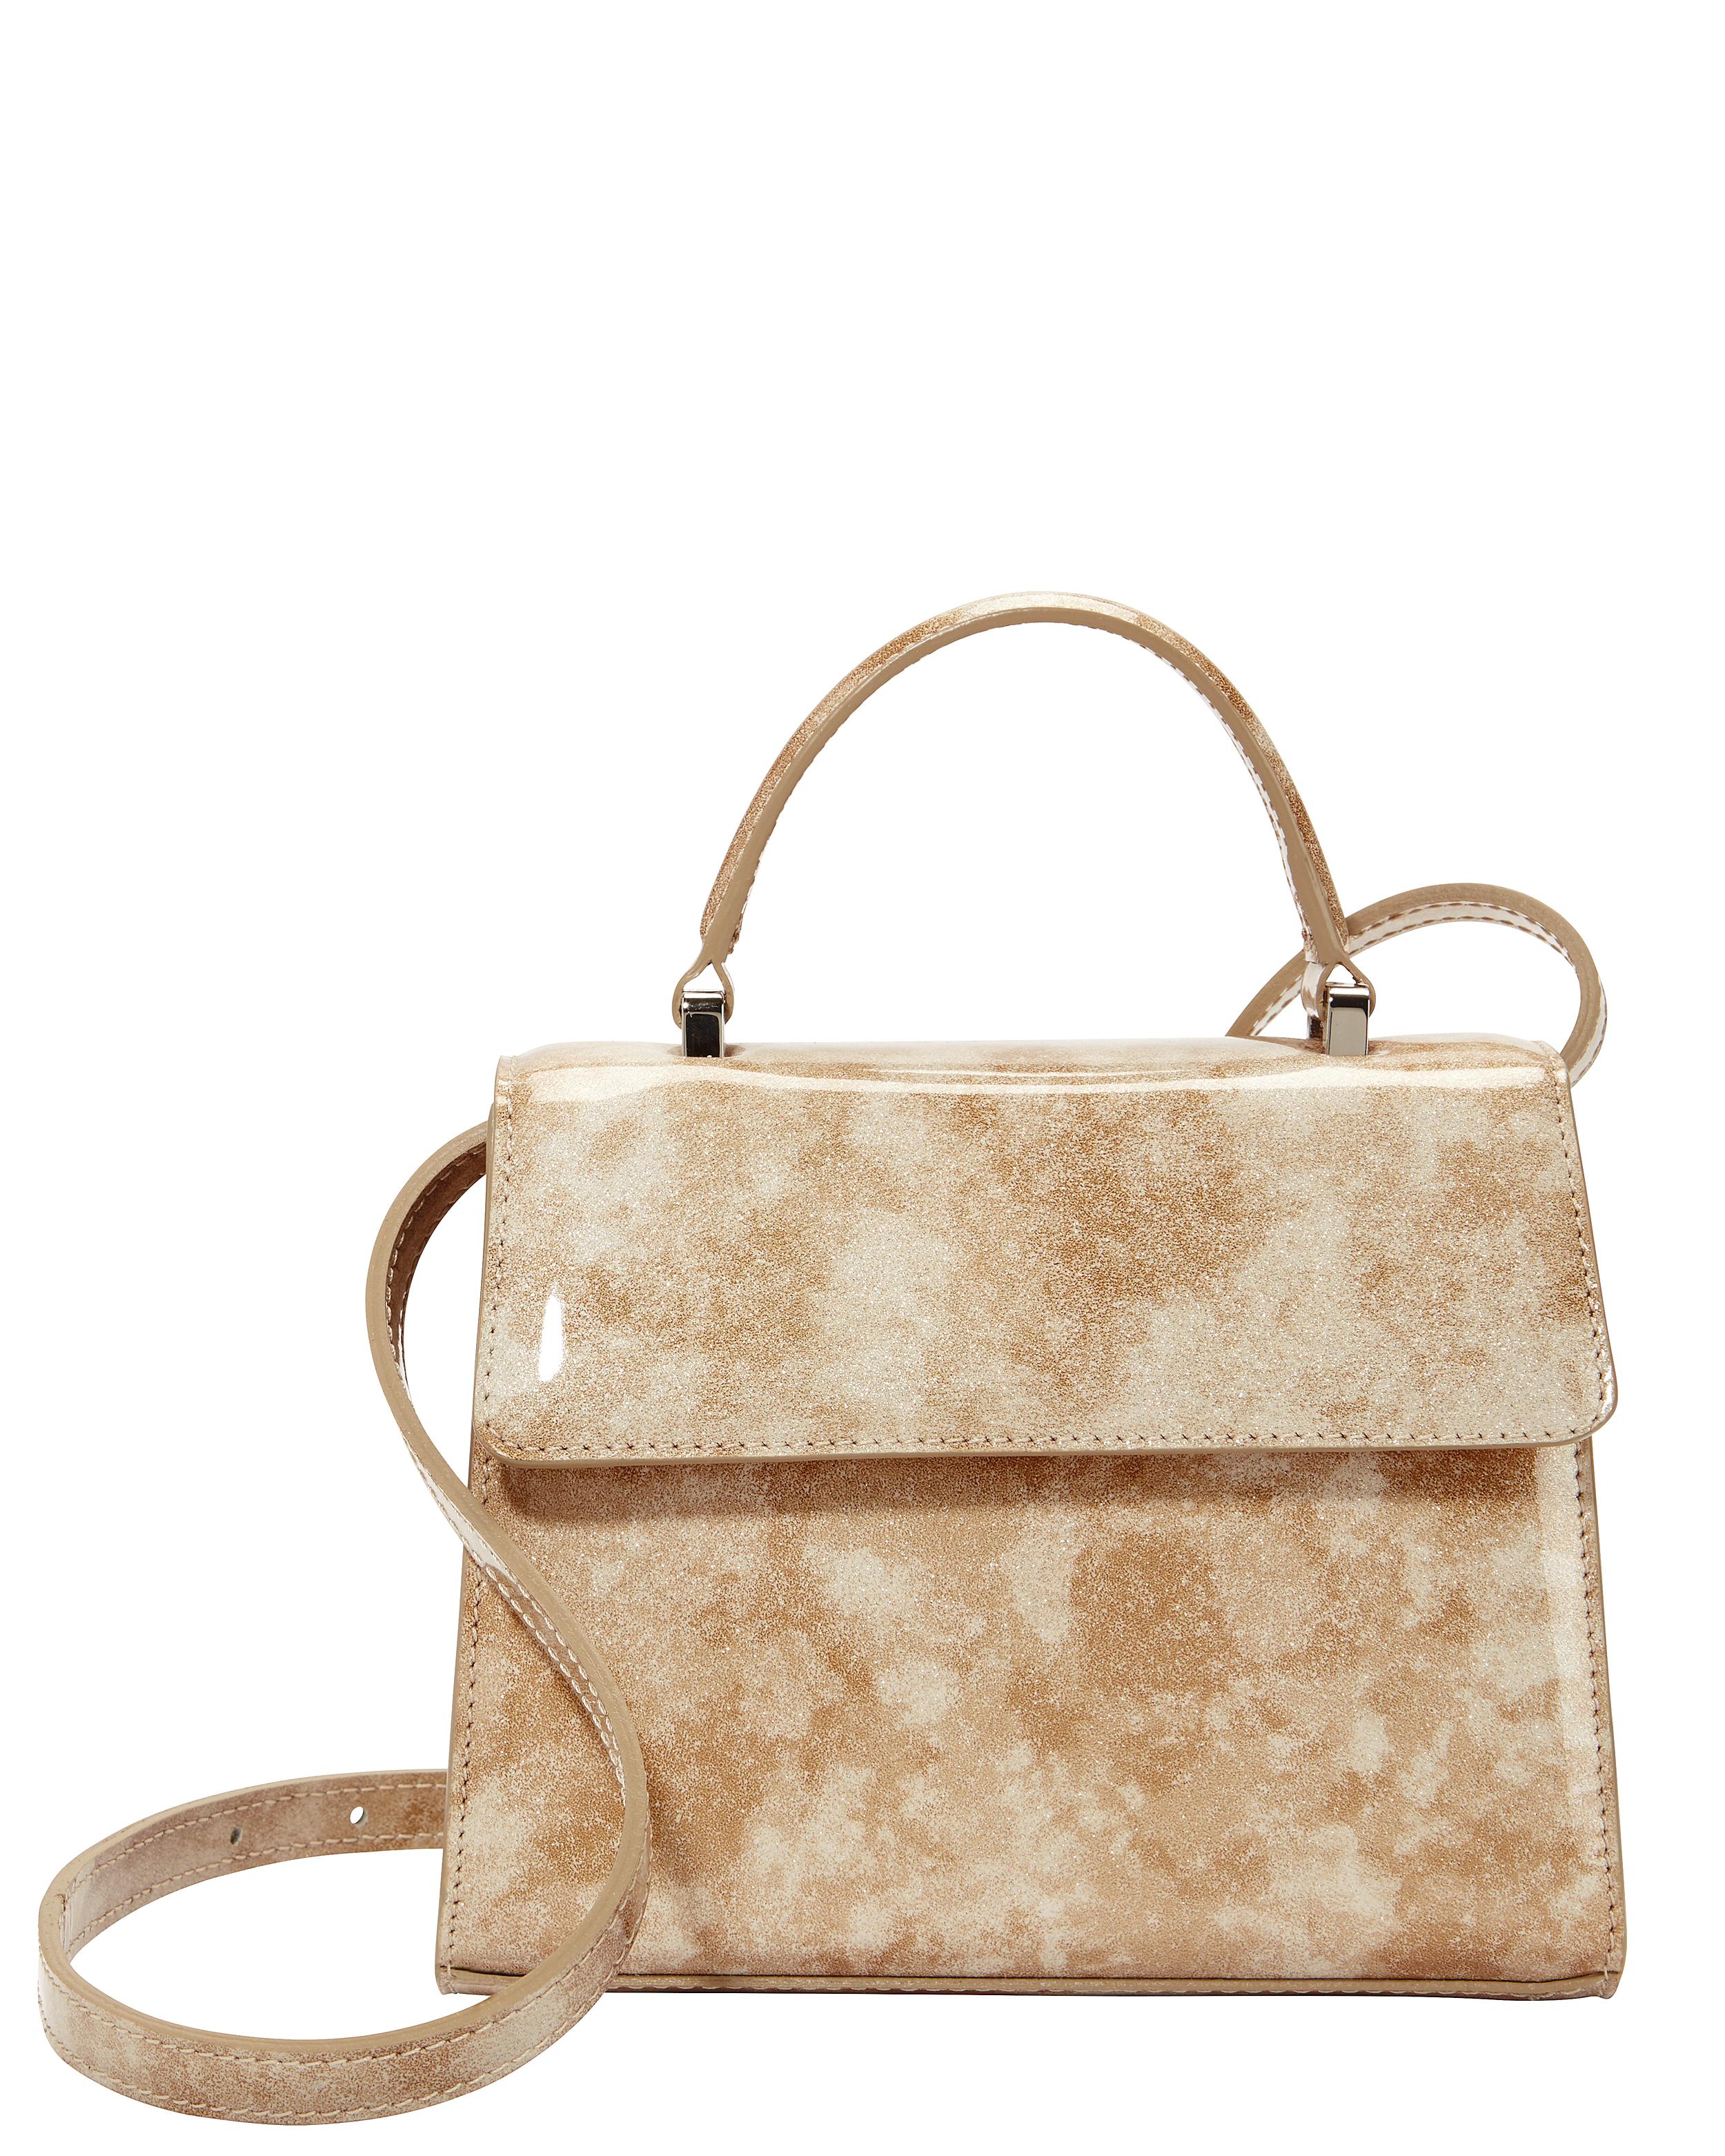 Marlow Glitter Bag